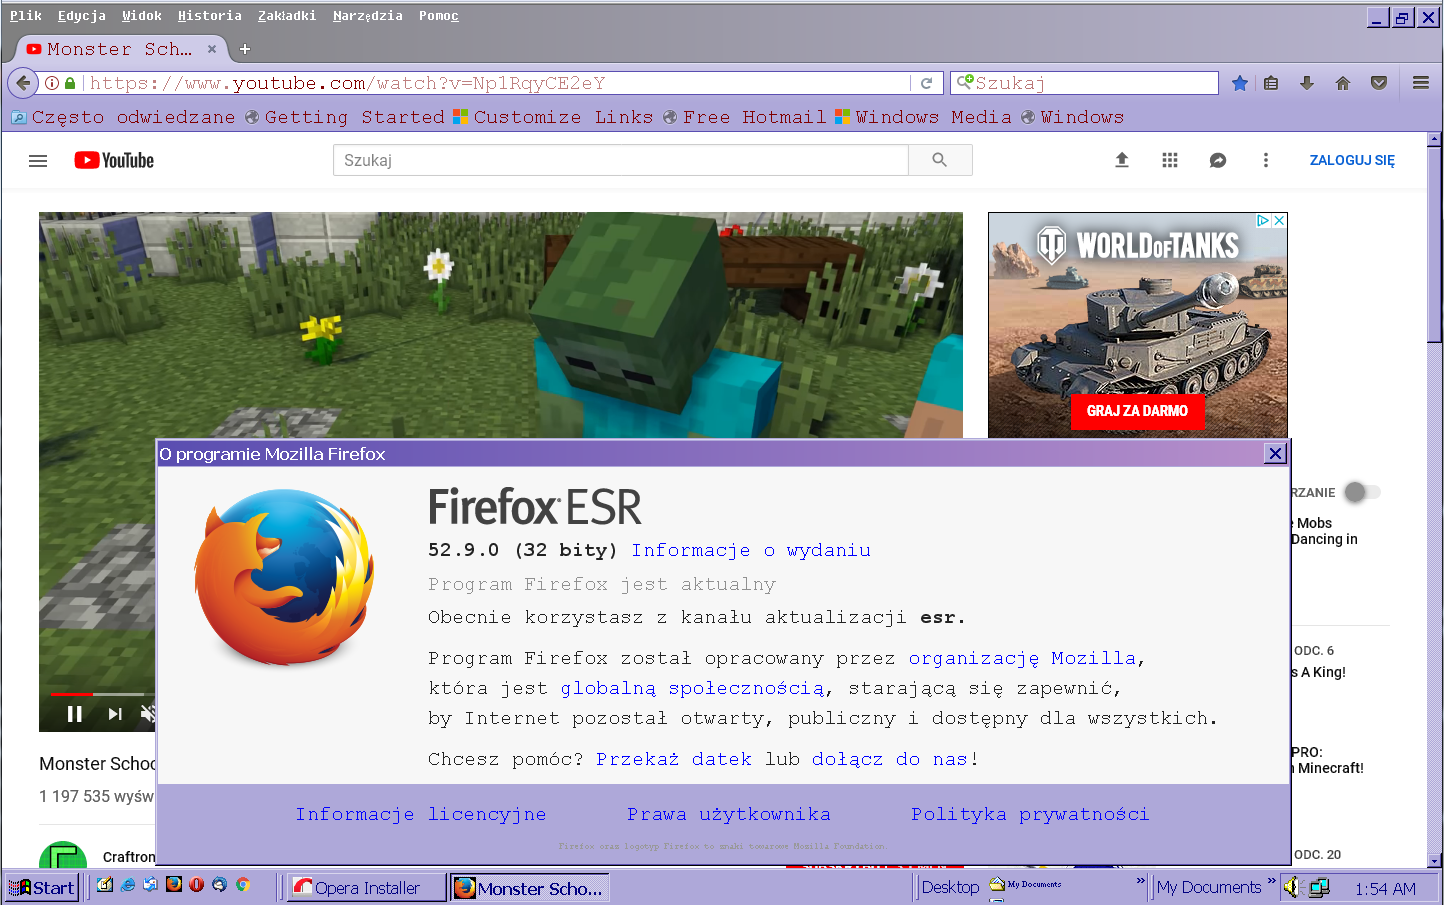 Firefox Esr 52